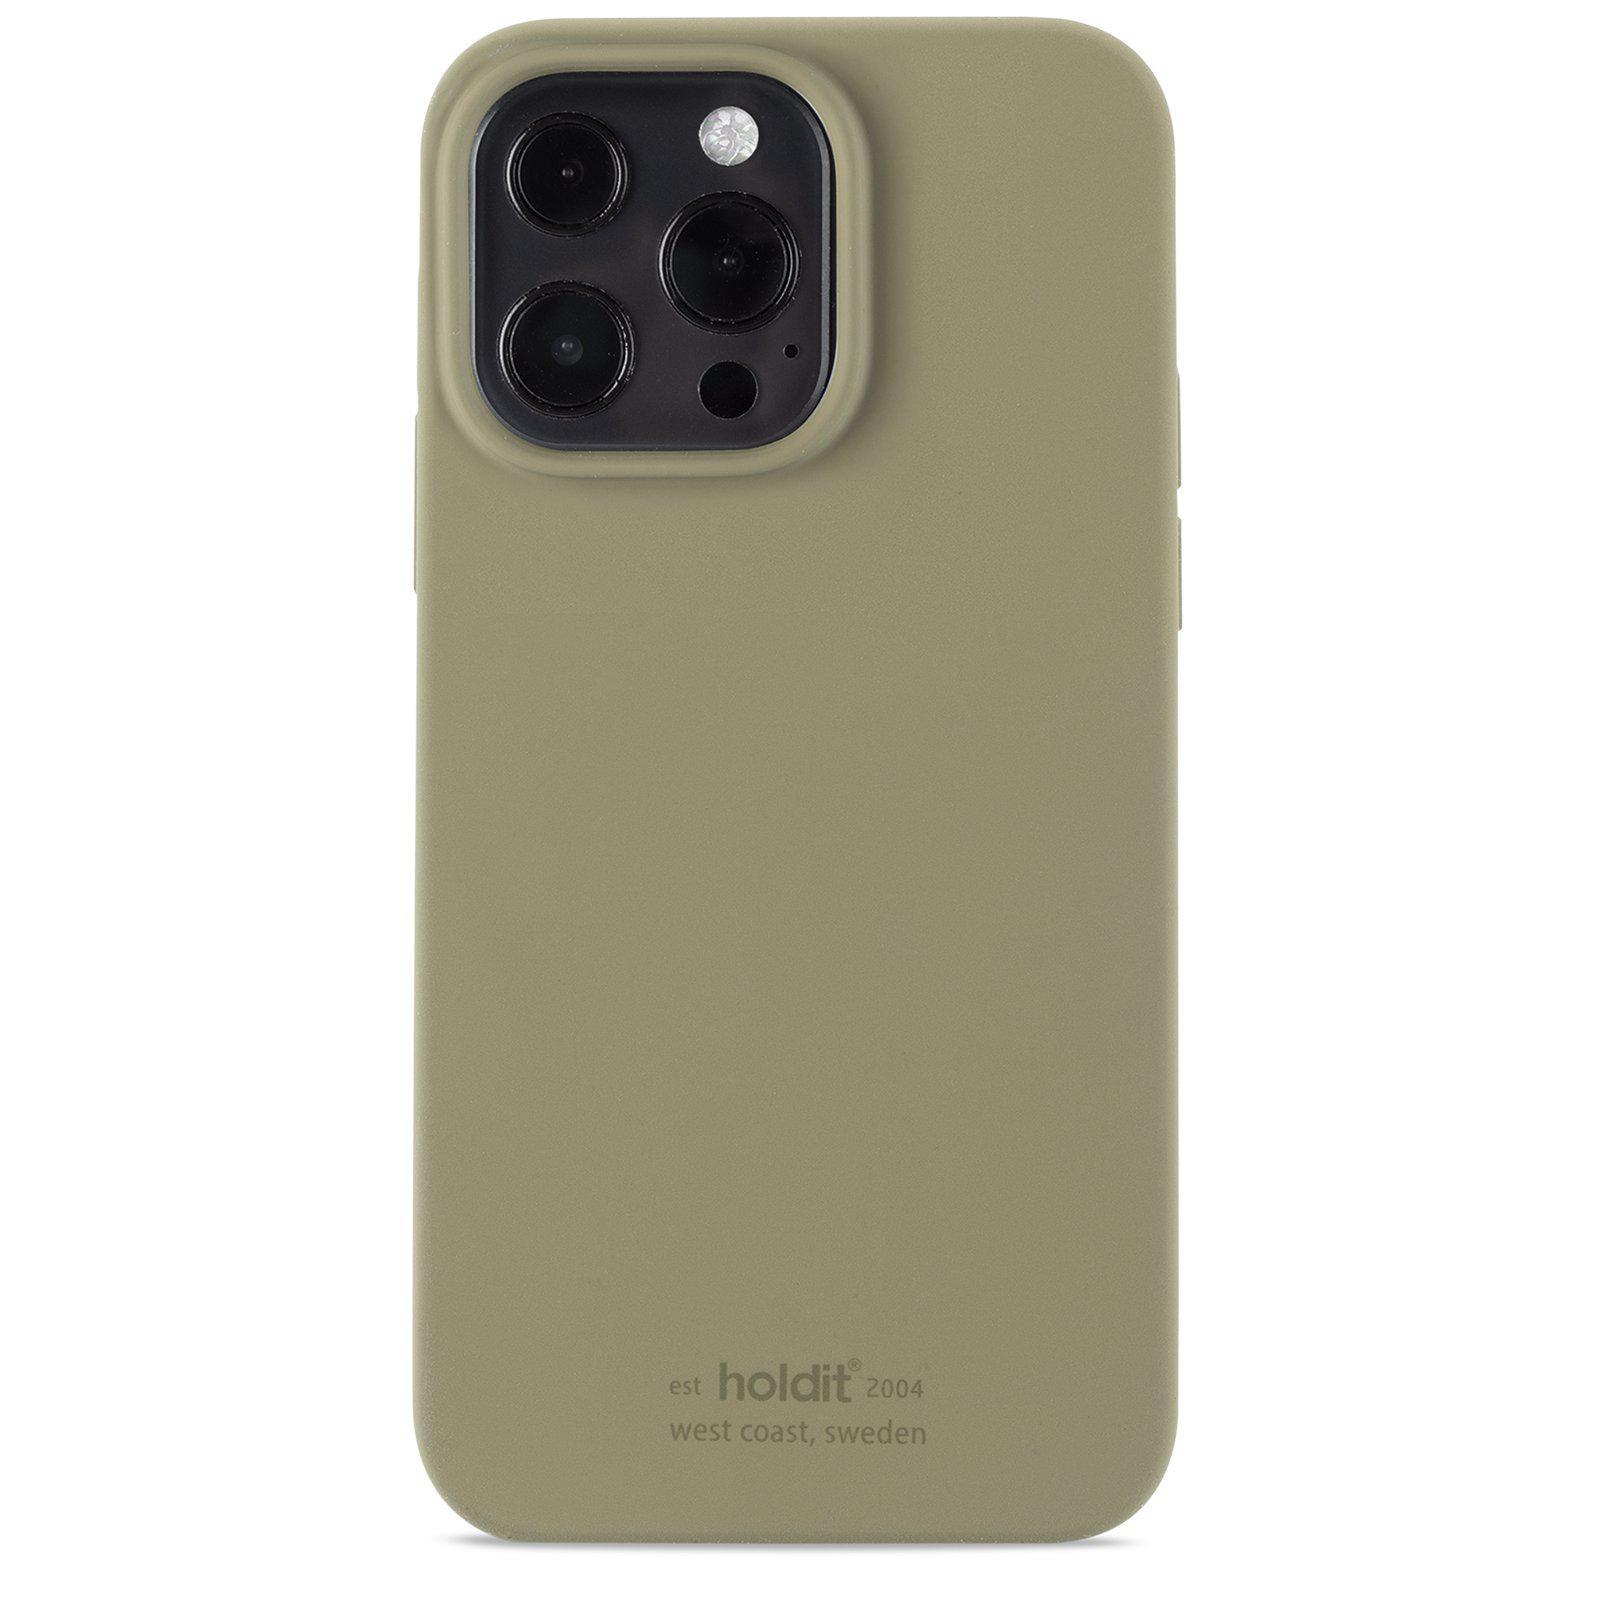 Silikonikuori iPhone 13 Pro Khaki Green